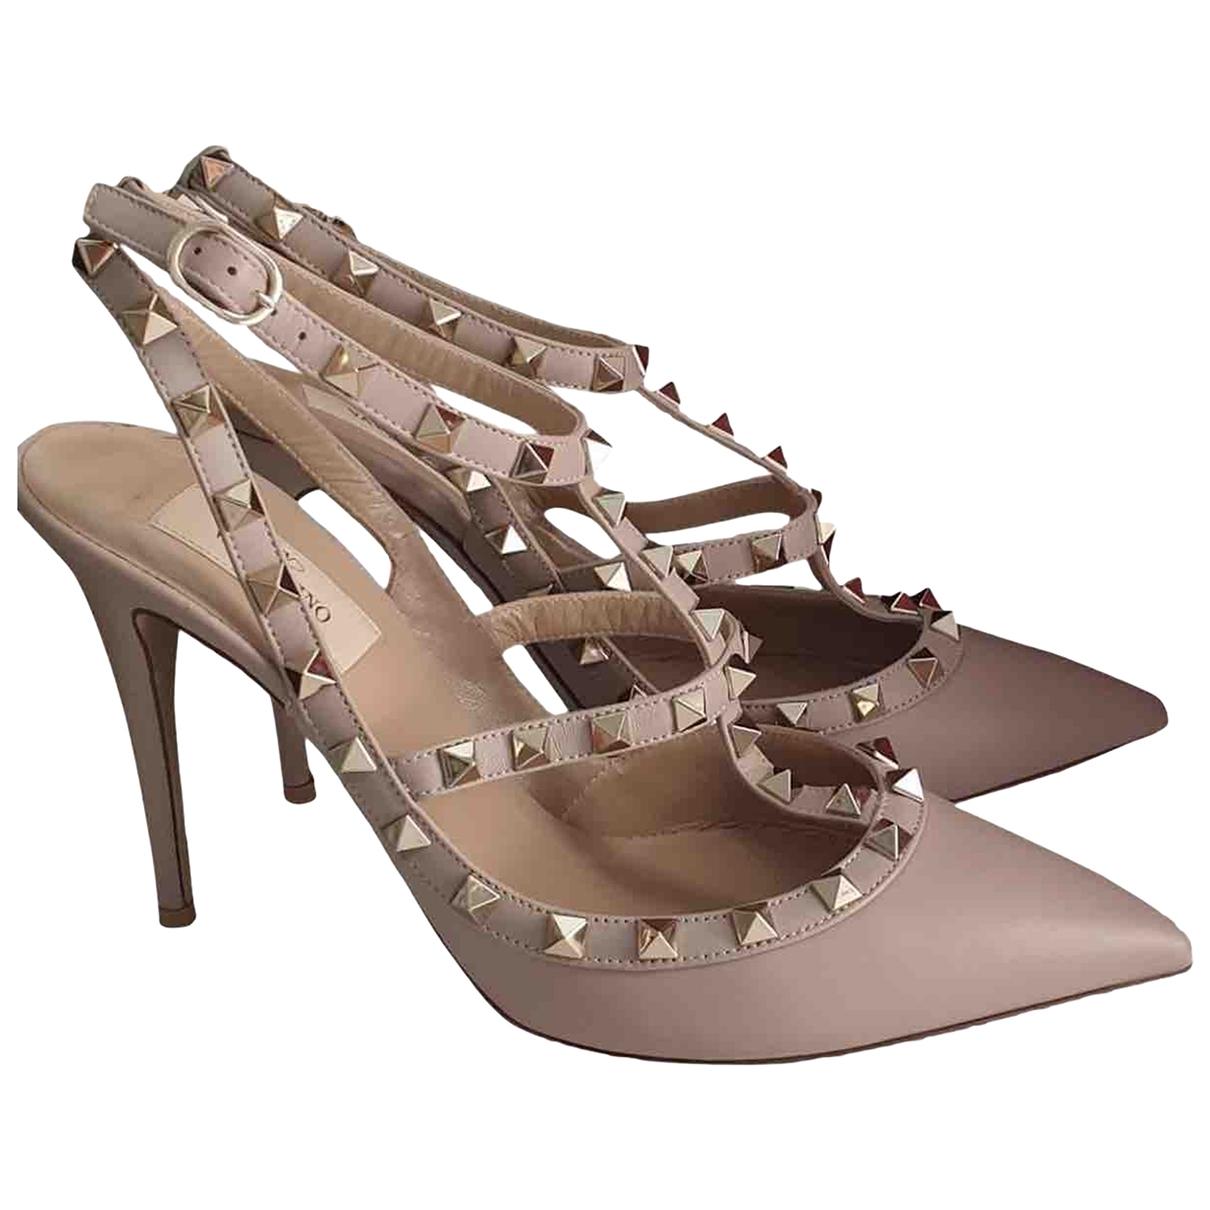 Valentino Garavani Rockstud Beige Leather Heels for Women 36 EU